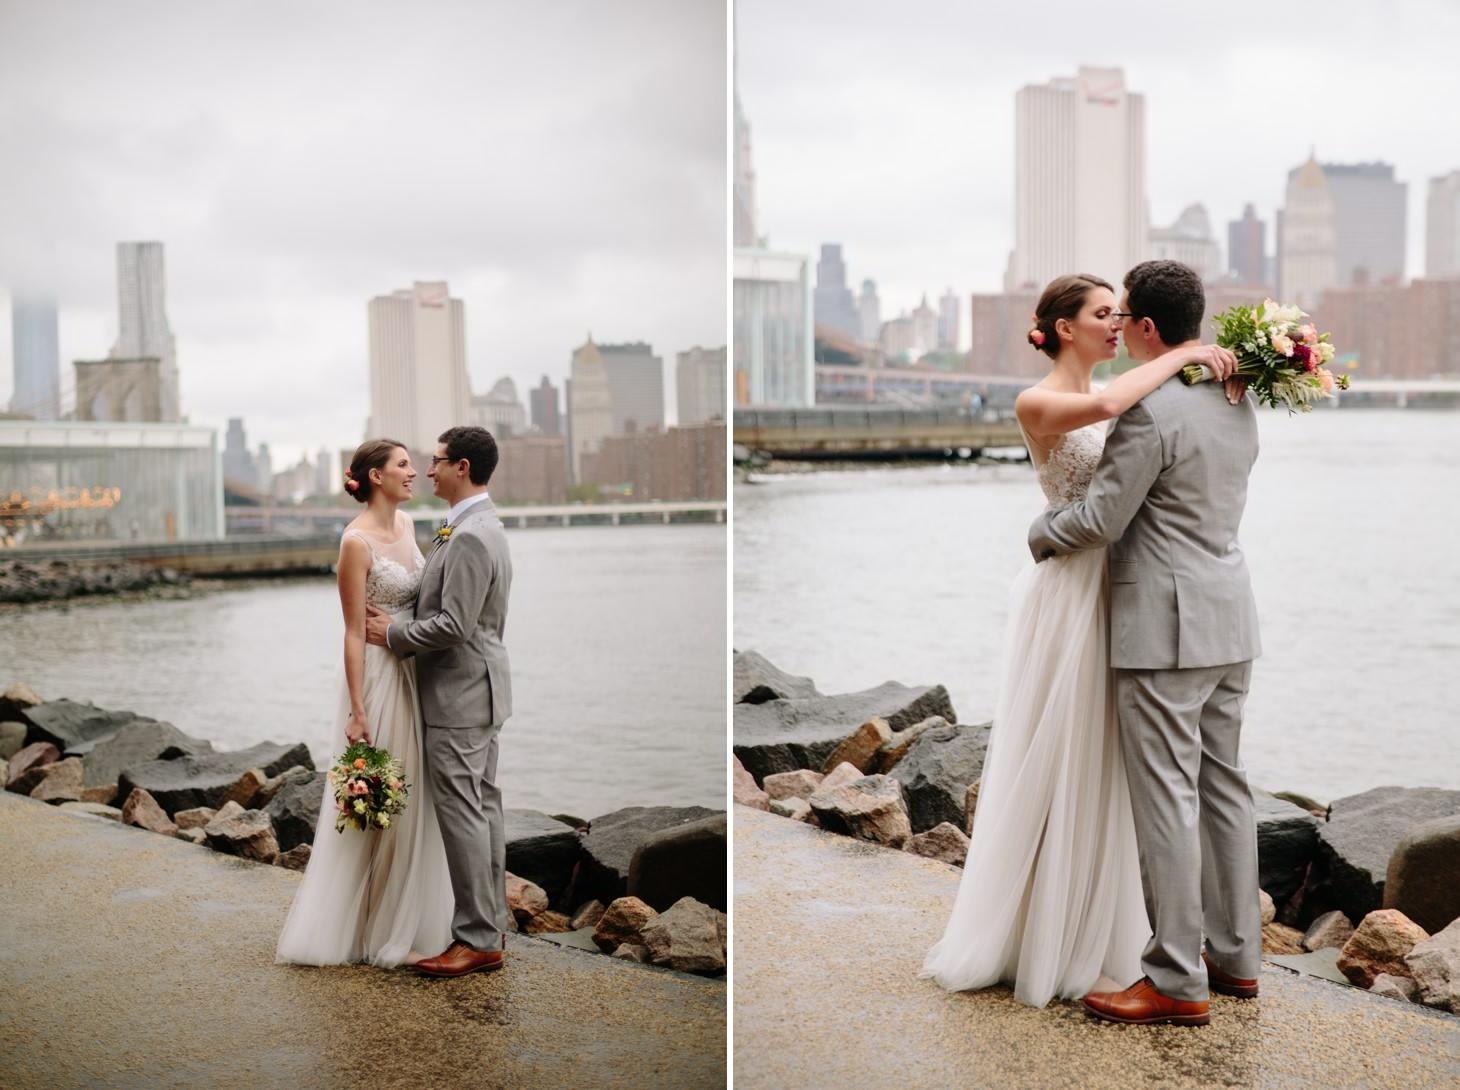 006-nyc-dumbo-loft-brooklyn-wedding-photographer-smitten-chickens-photo-.jpg